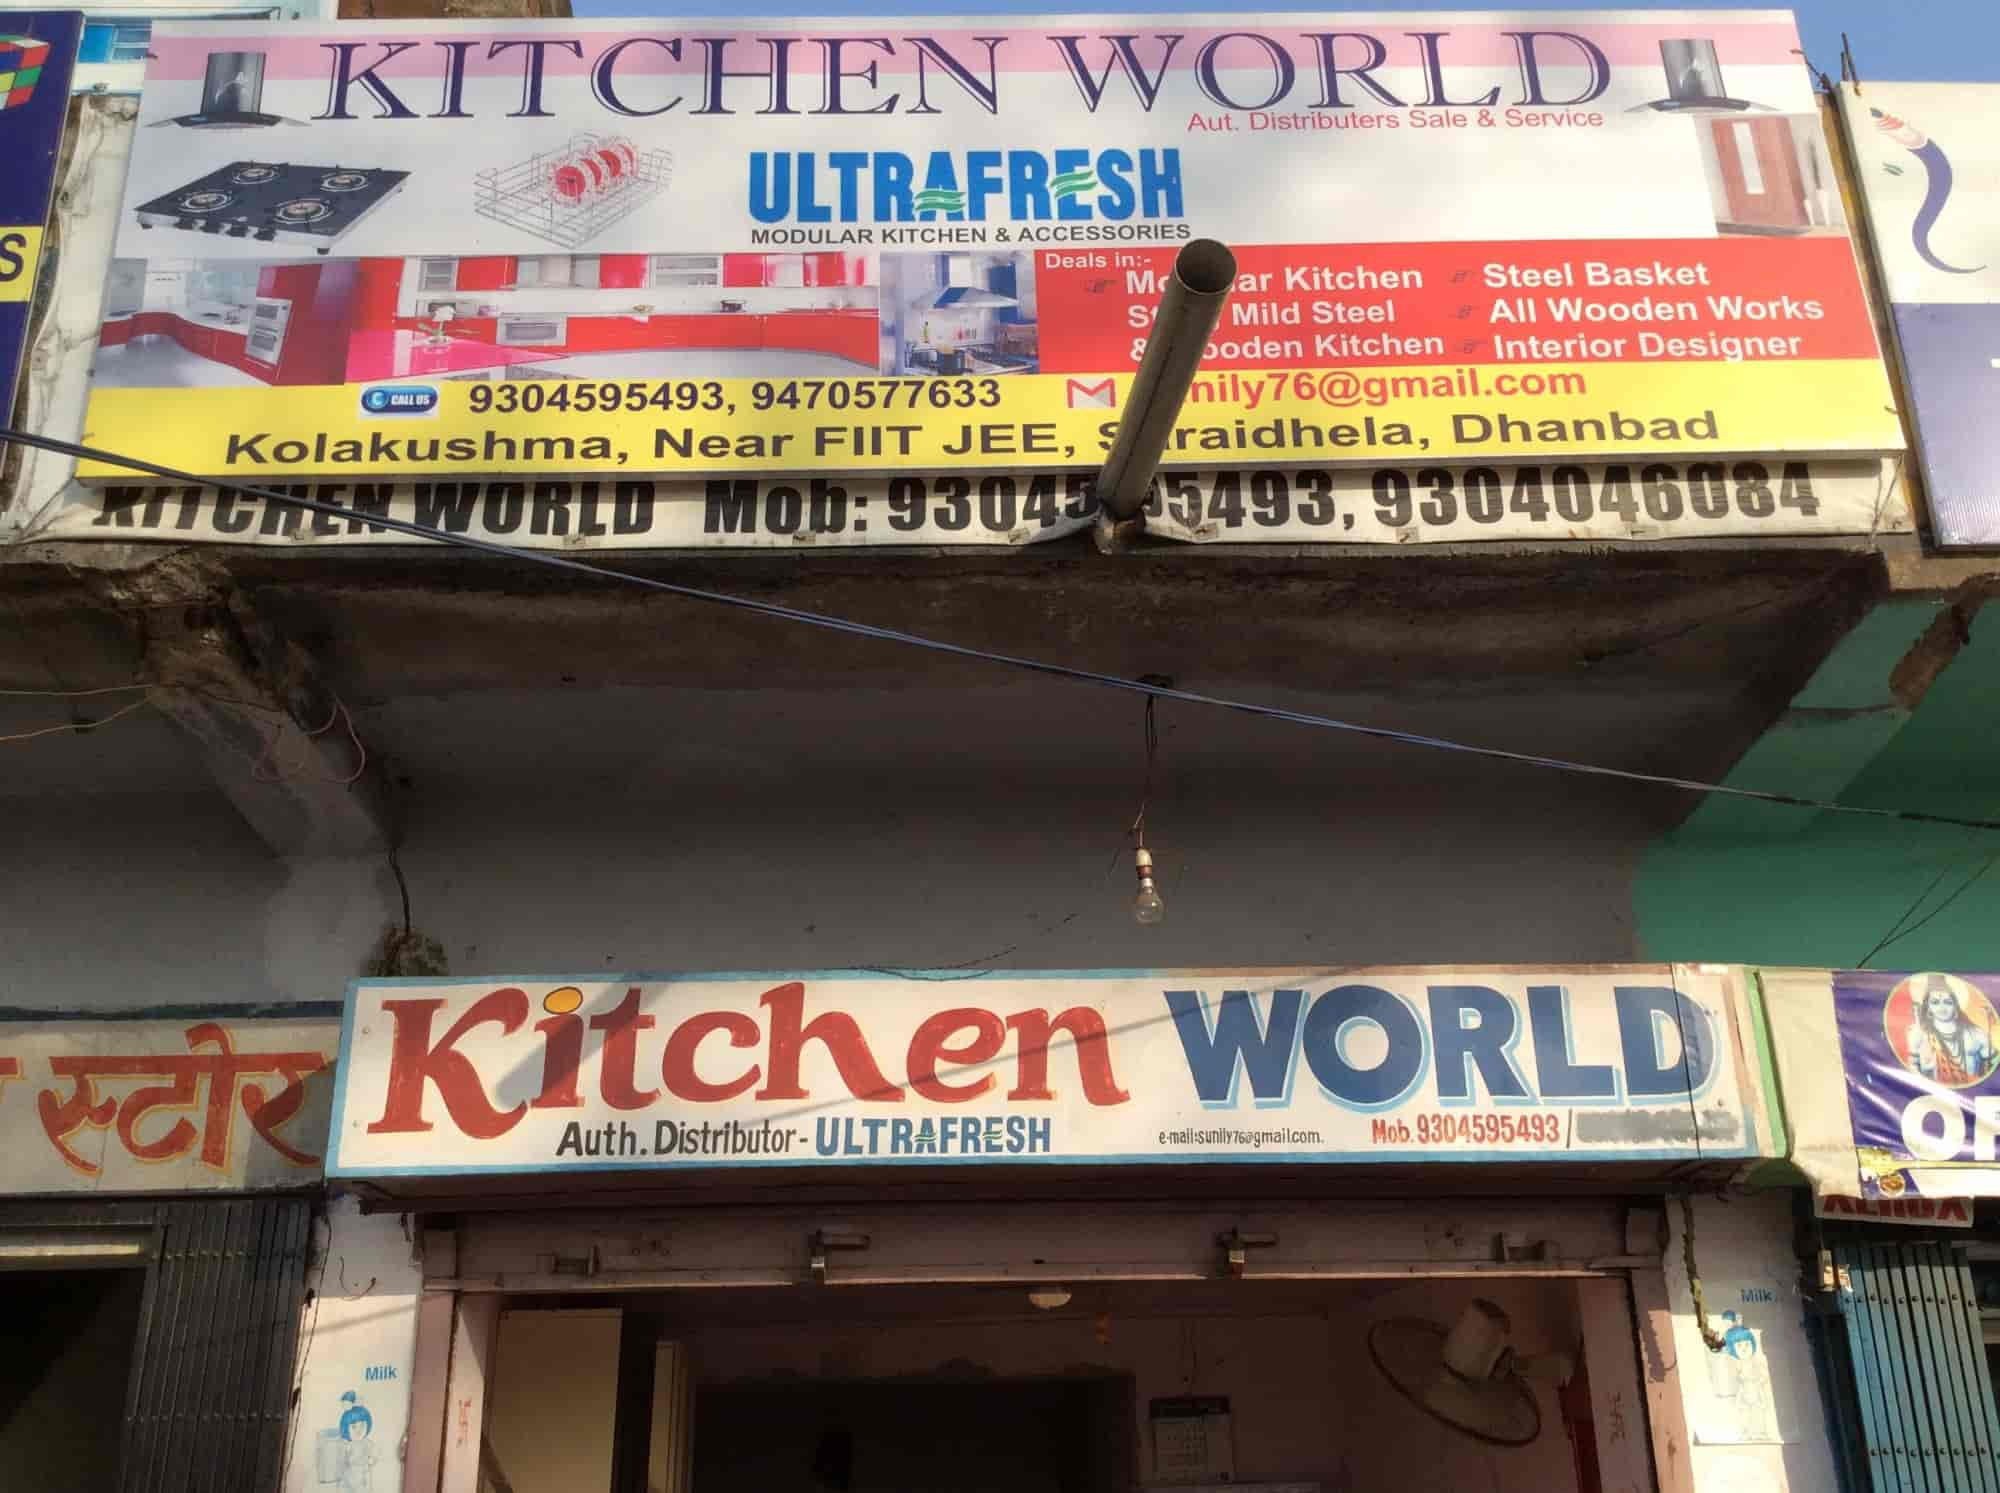 Kitchen world photos saraidhela dhanbad modular kitchen dealers